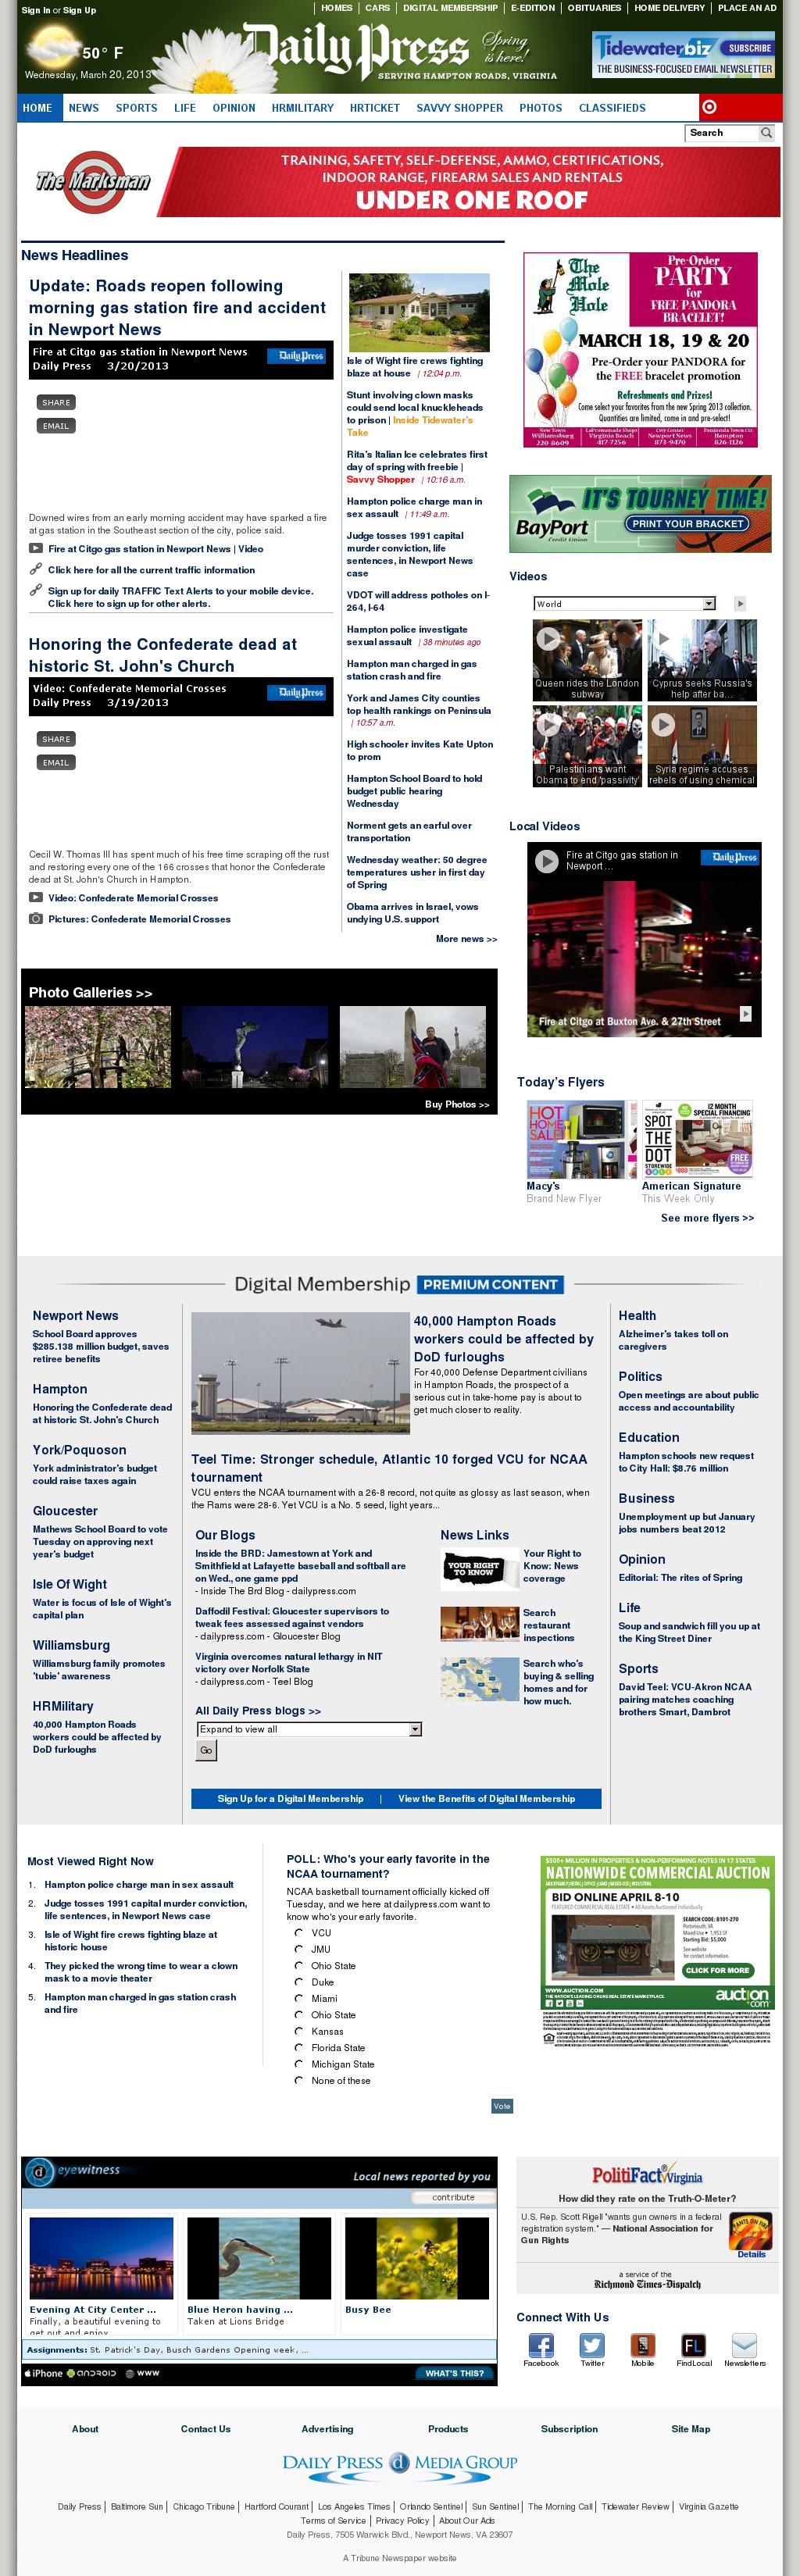 (Hampton Roads) Daily Press at Wednesday March 20, 2013, 5:05 p.m. UTC